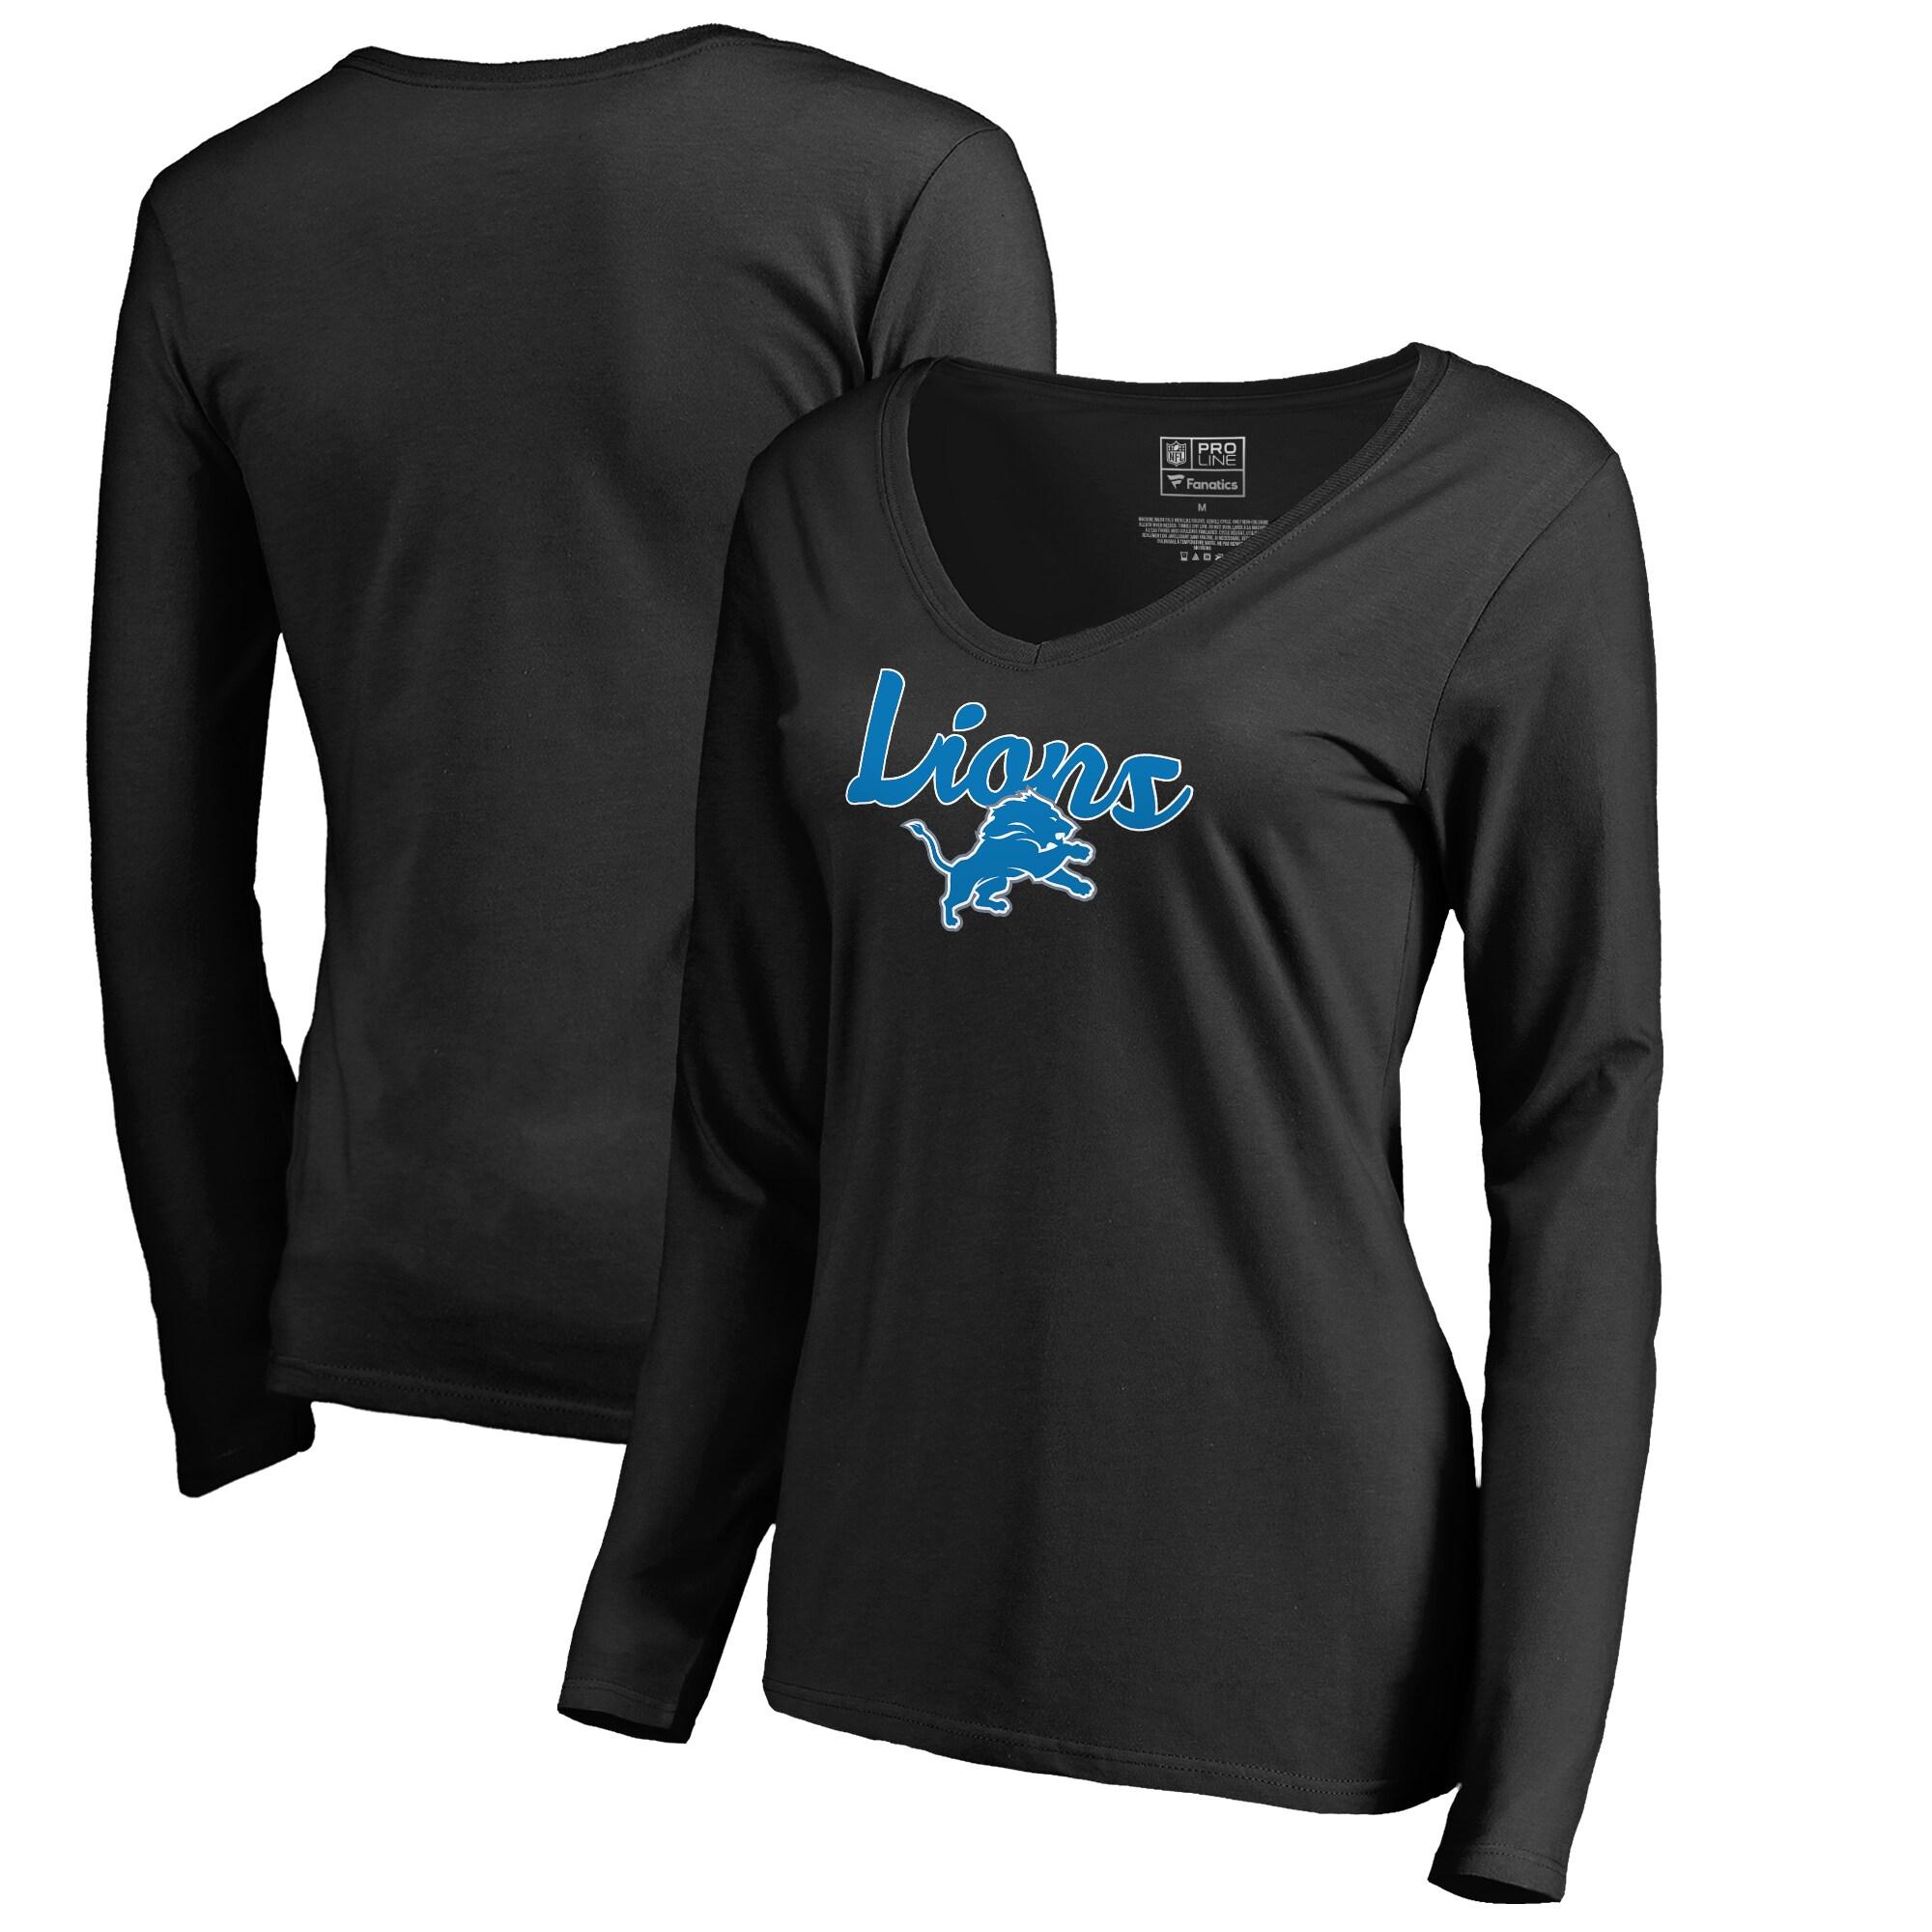 Detroit Lions NFL Pro Line by Fanatics Branded Women's Freehand Long Sleeve V-Neck T-Shirt - Black